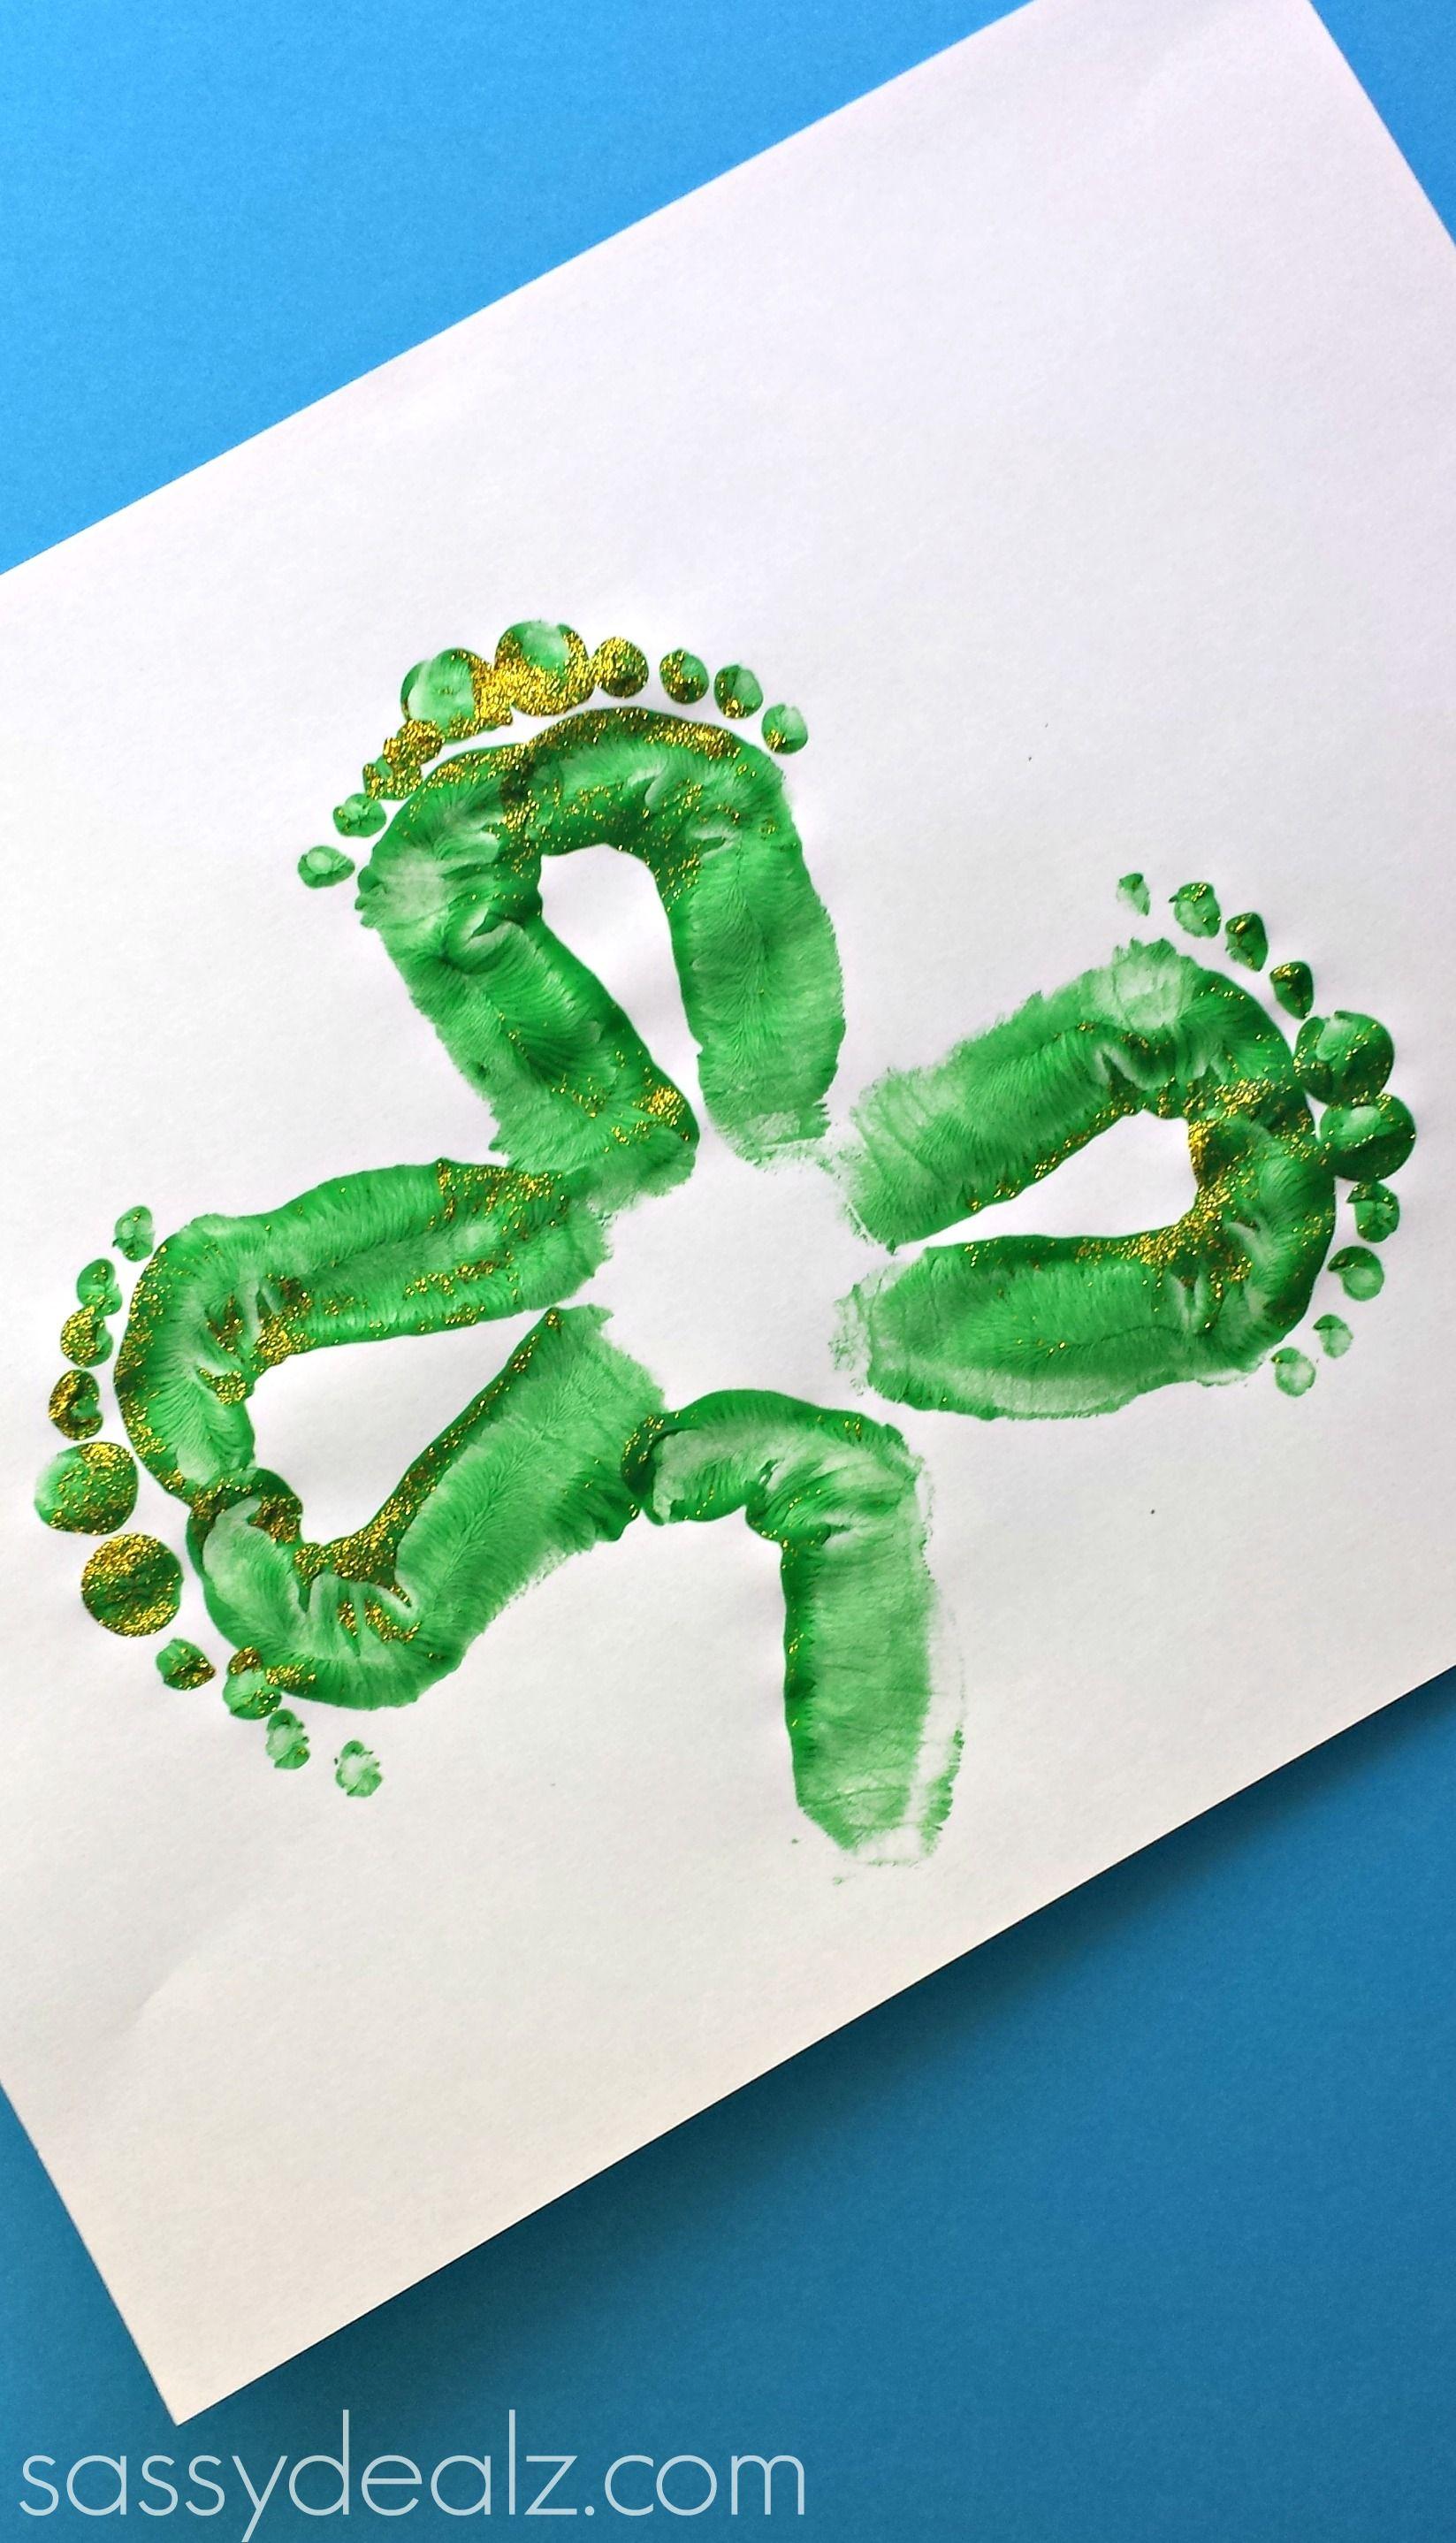 Shamrock Footprint Craft For Kids St Patricks Day Art Project Diy